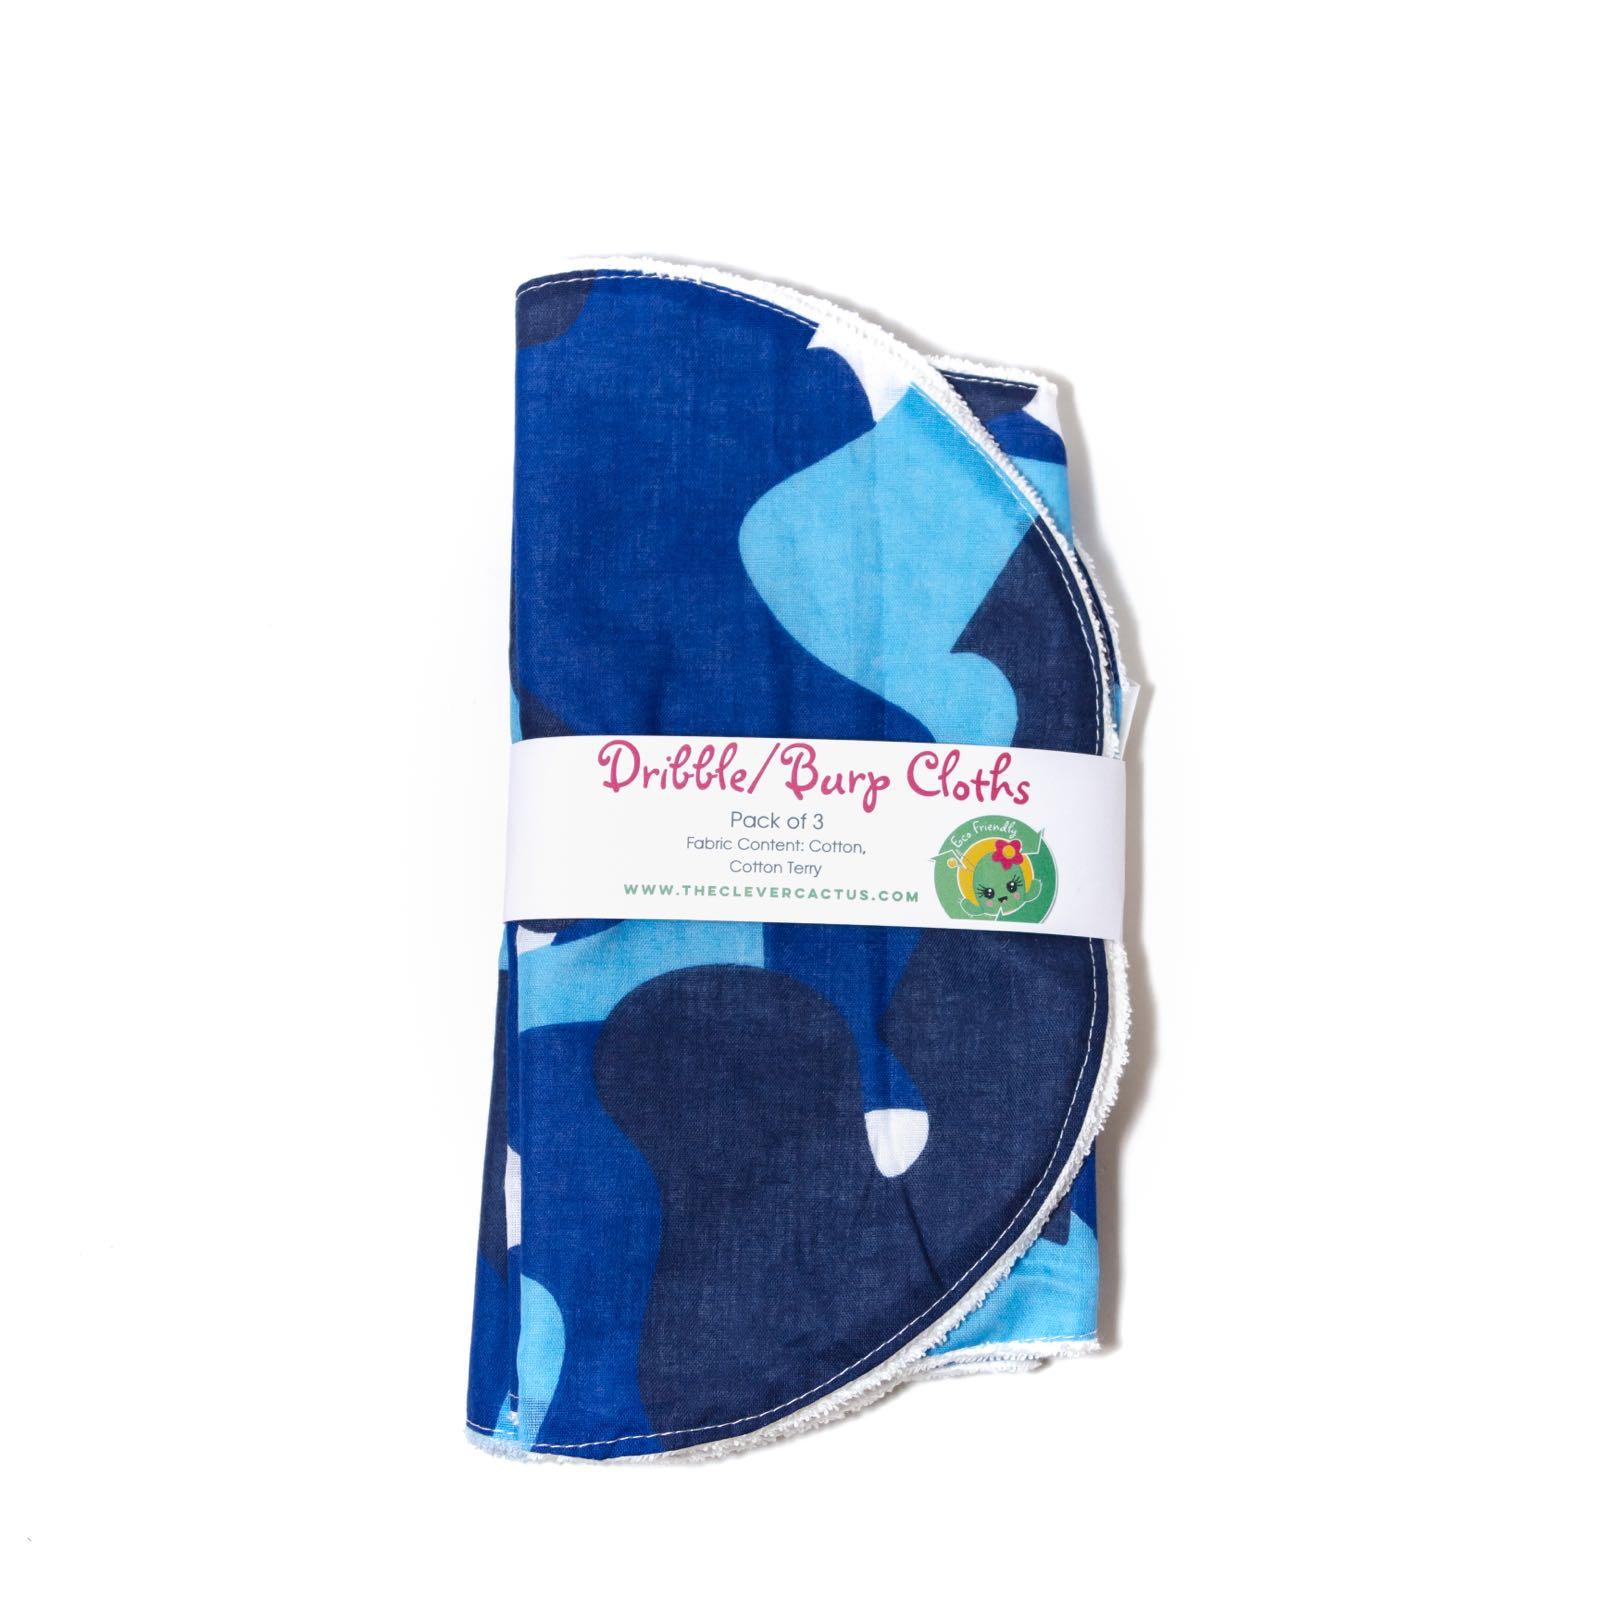 Dribble / Burp Cloth